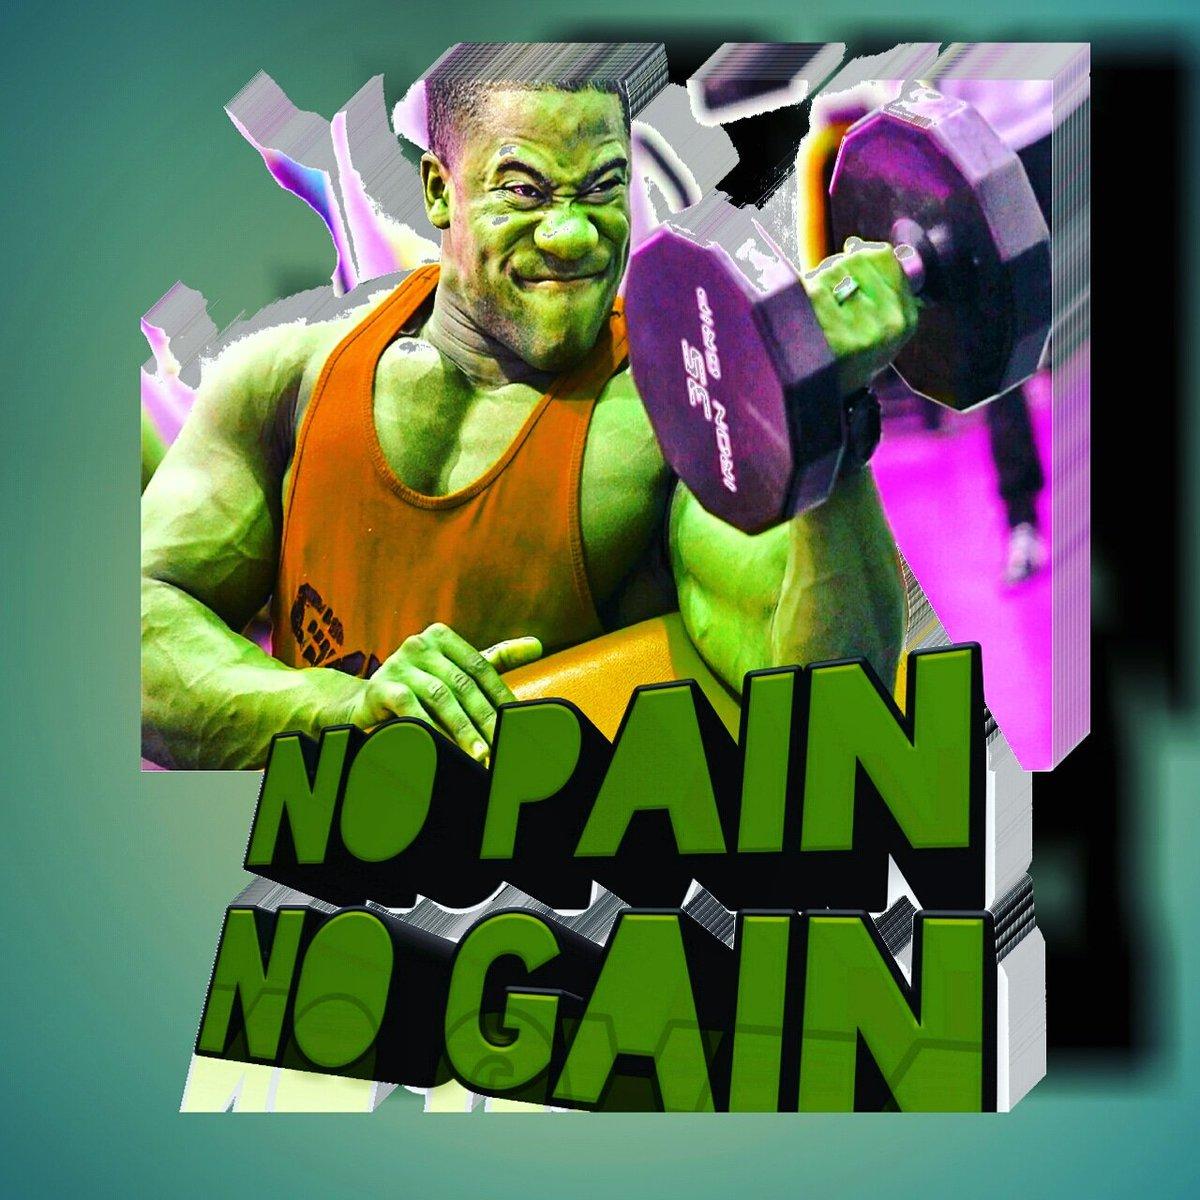 #fitness #FitnessMotivation #NoPainNoGain #gym #lifeisgoodpic.twitter.com/9OdKbVwYNZ